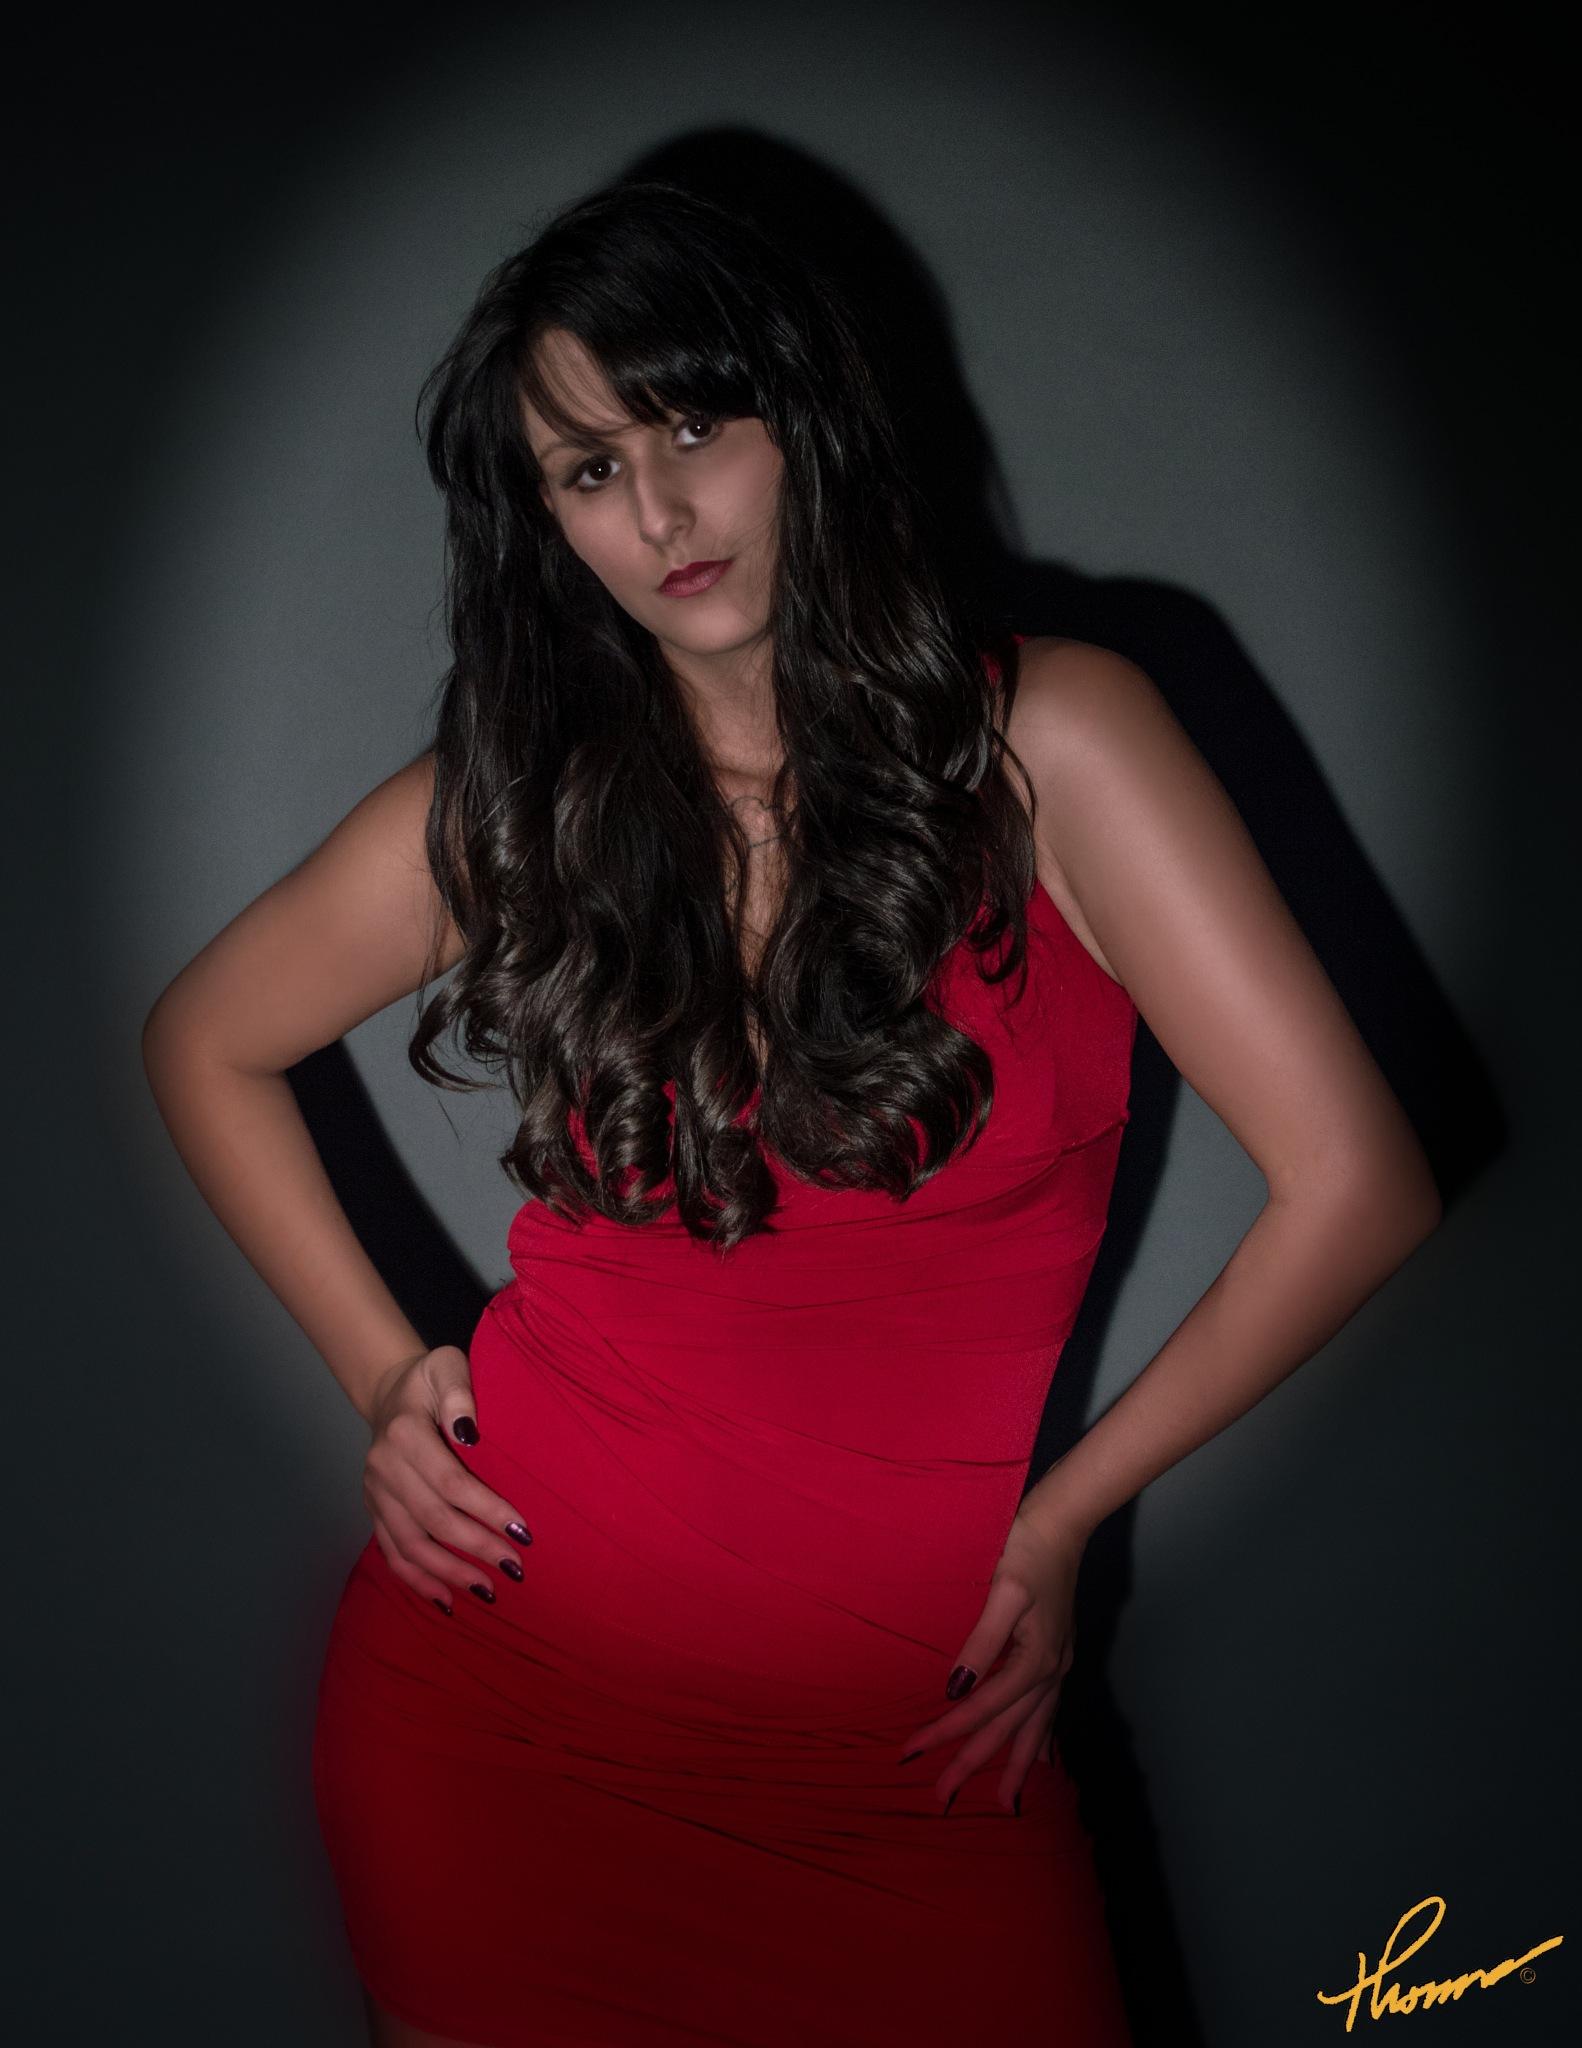 Red Dress High Fashion by Shameron Nicole Model